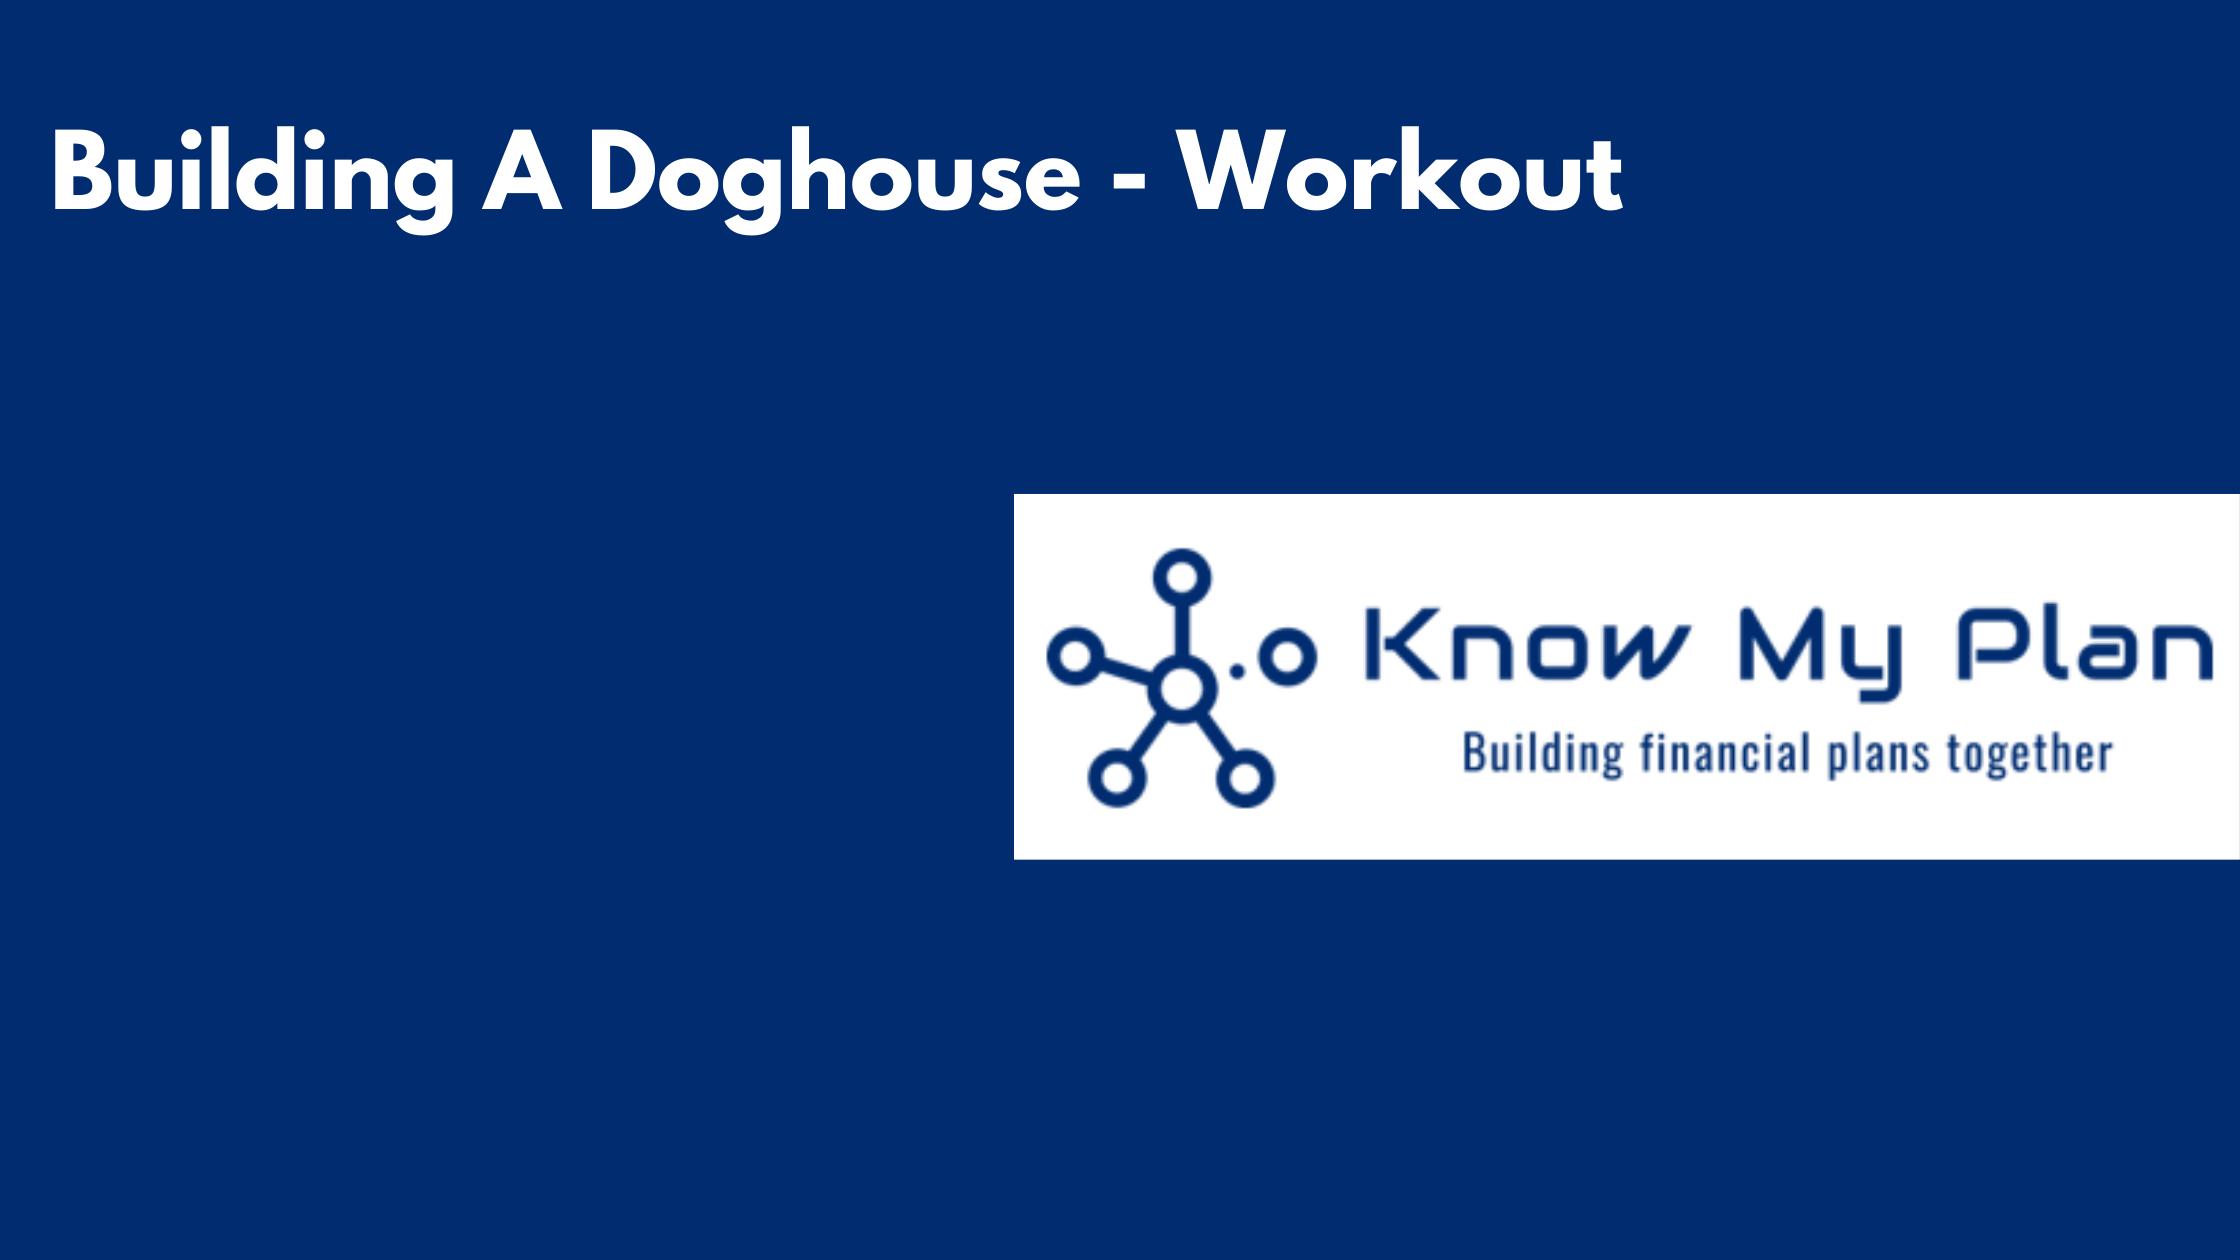 Building A Doghouse - Workout Thumbnail